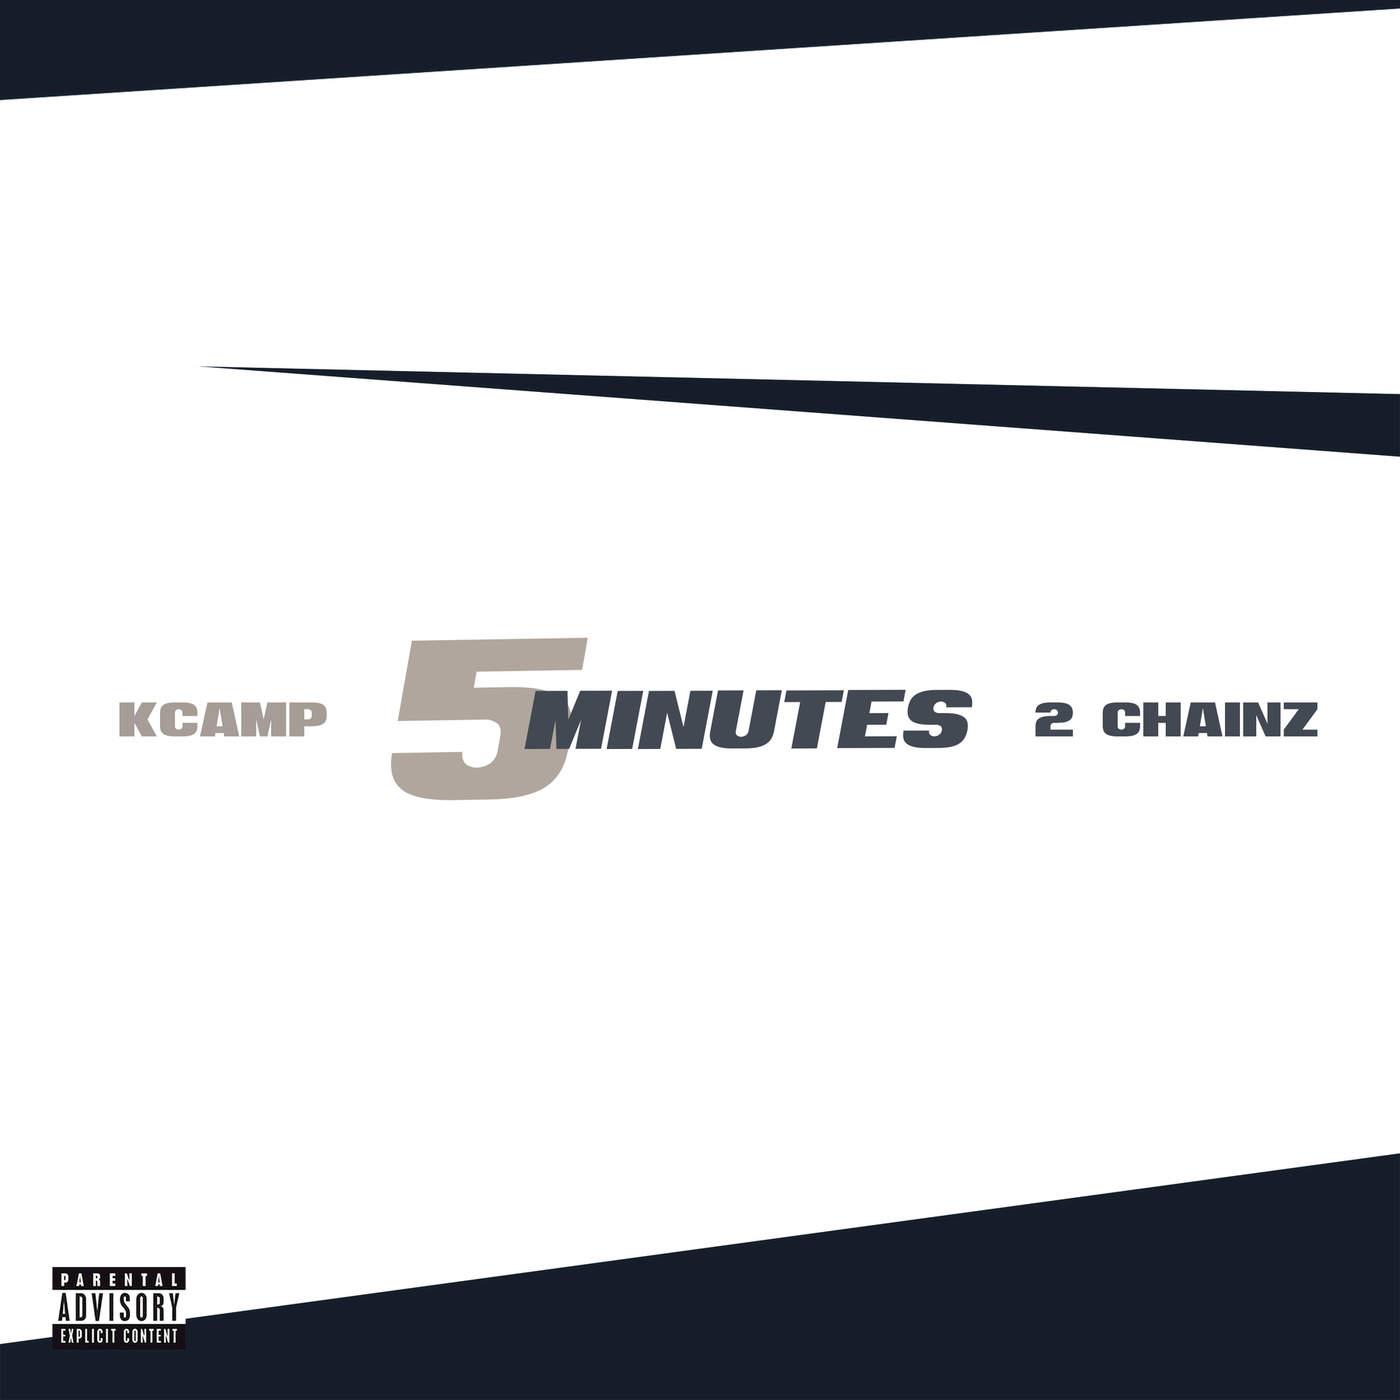 K CAMP 5 minutes